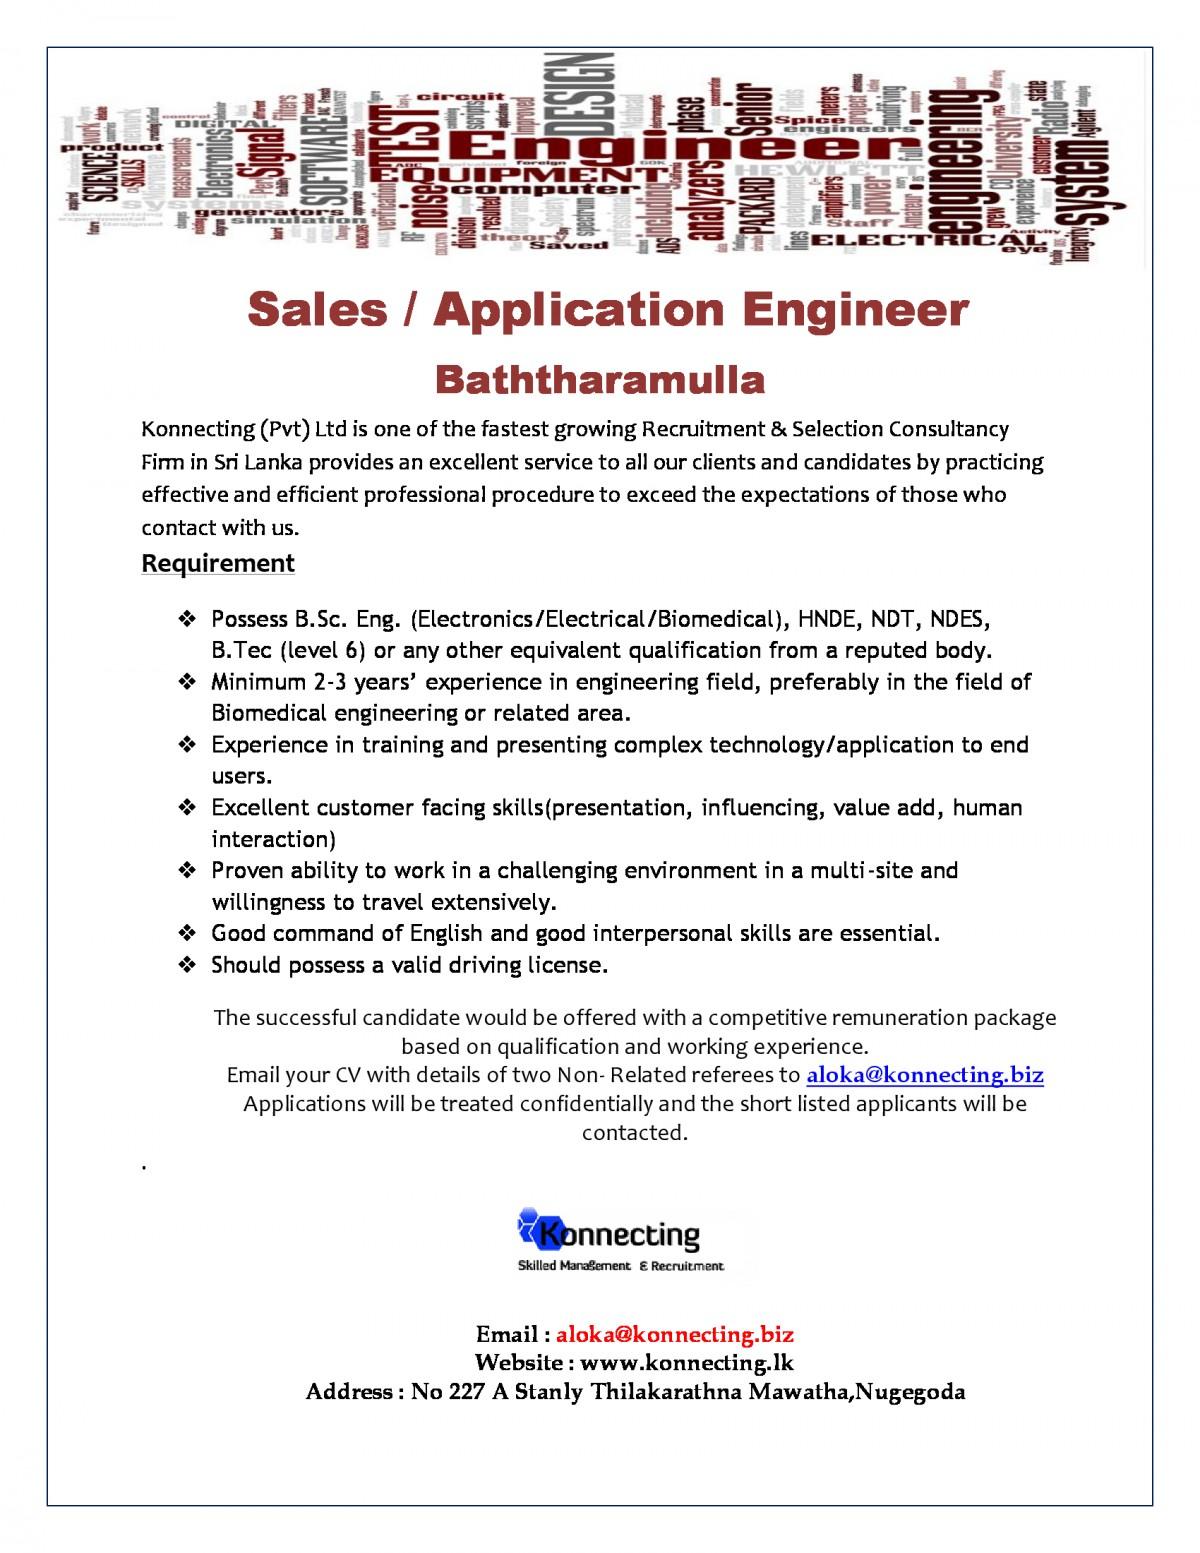 Sales / Application Engineer Job Vacancy in Sri Lanka